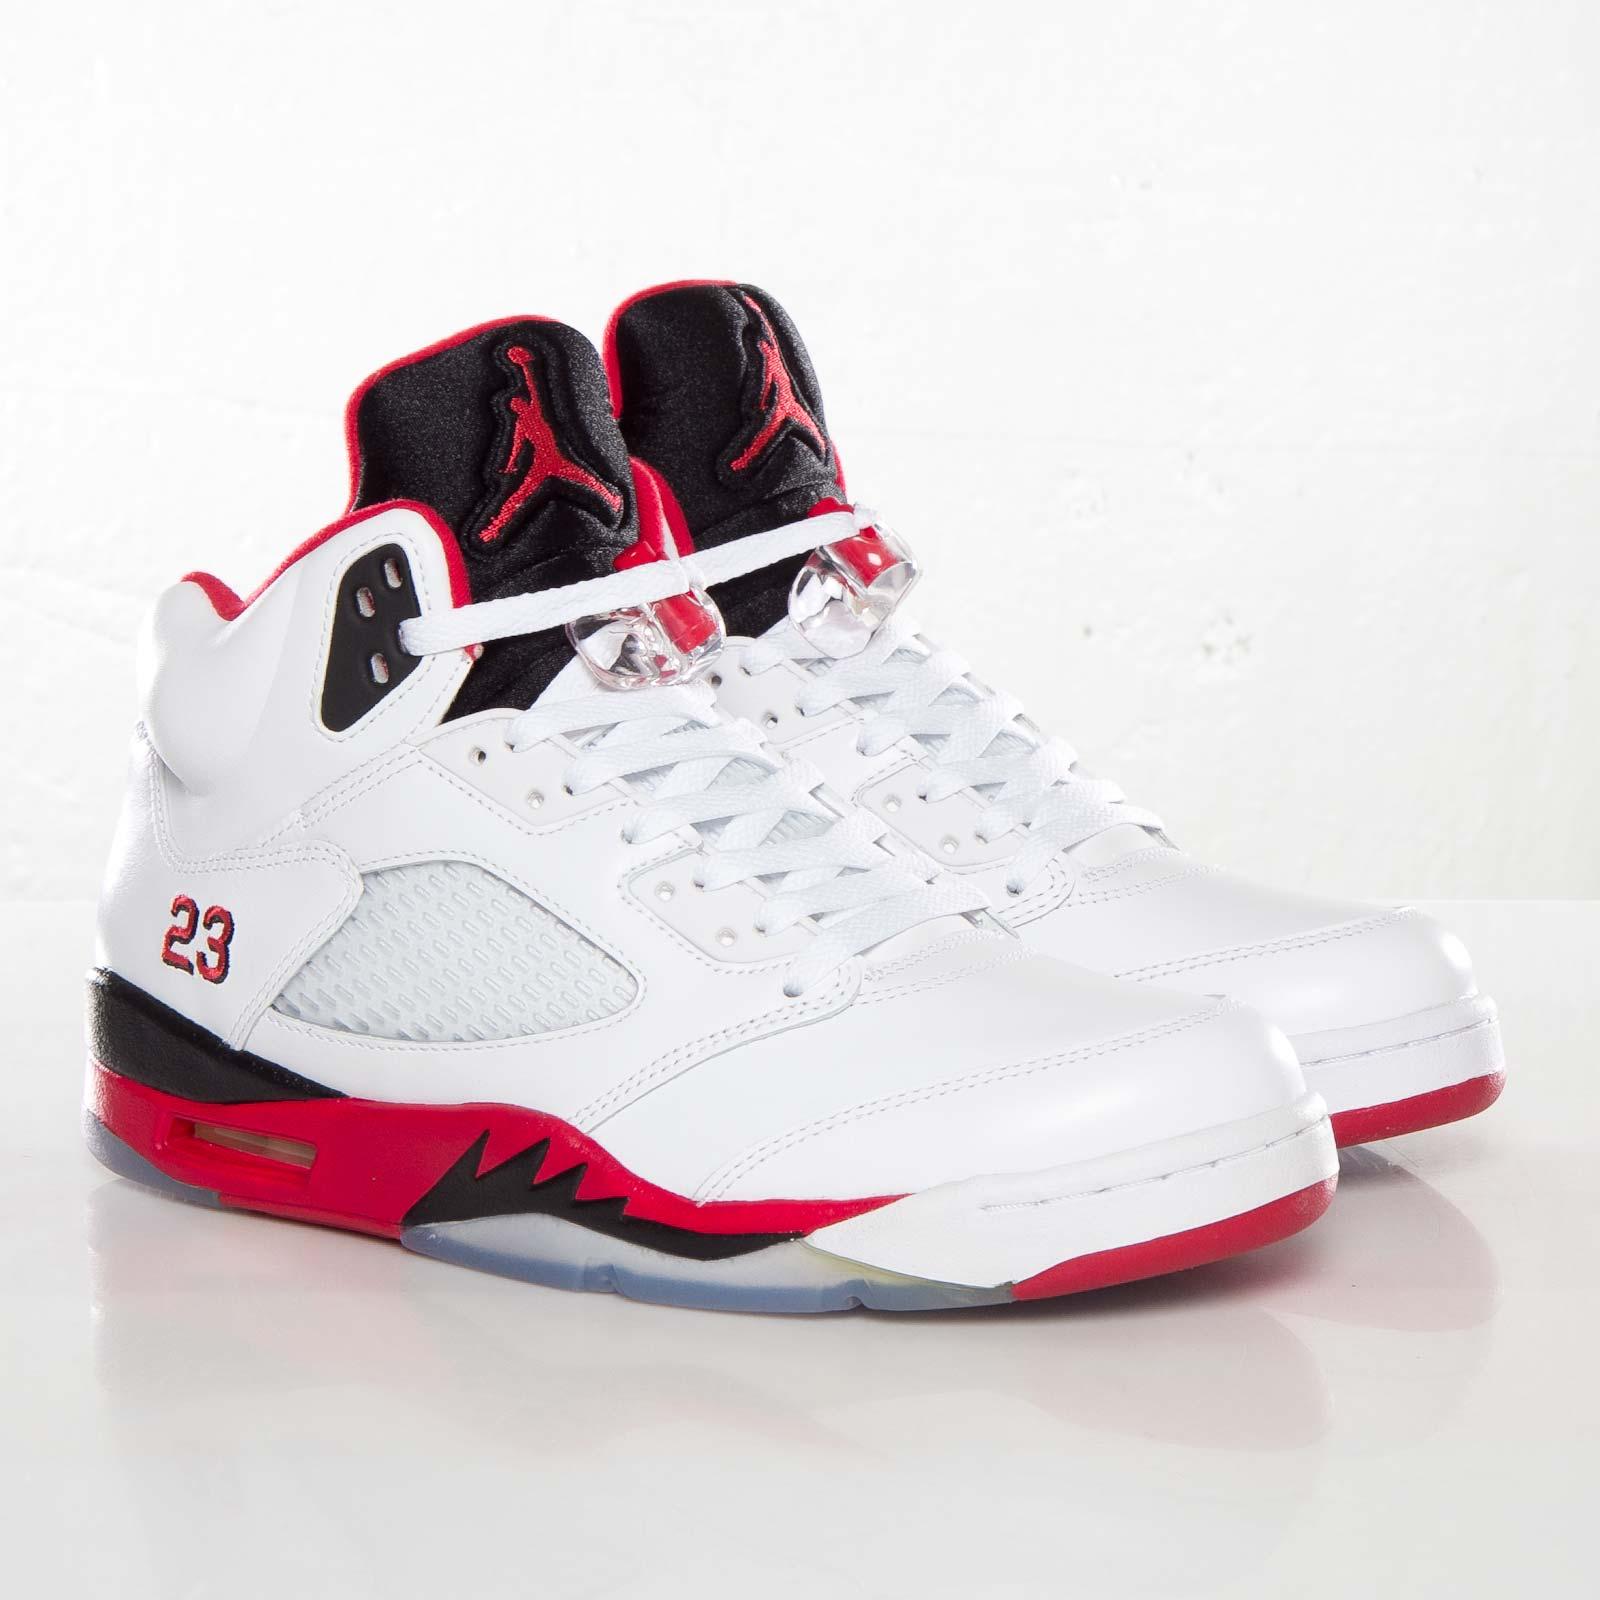 check out 0aab8 29cee Jordan Brand Air Jordan 5 Retro